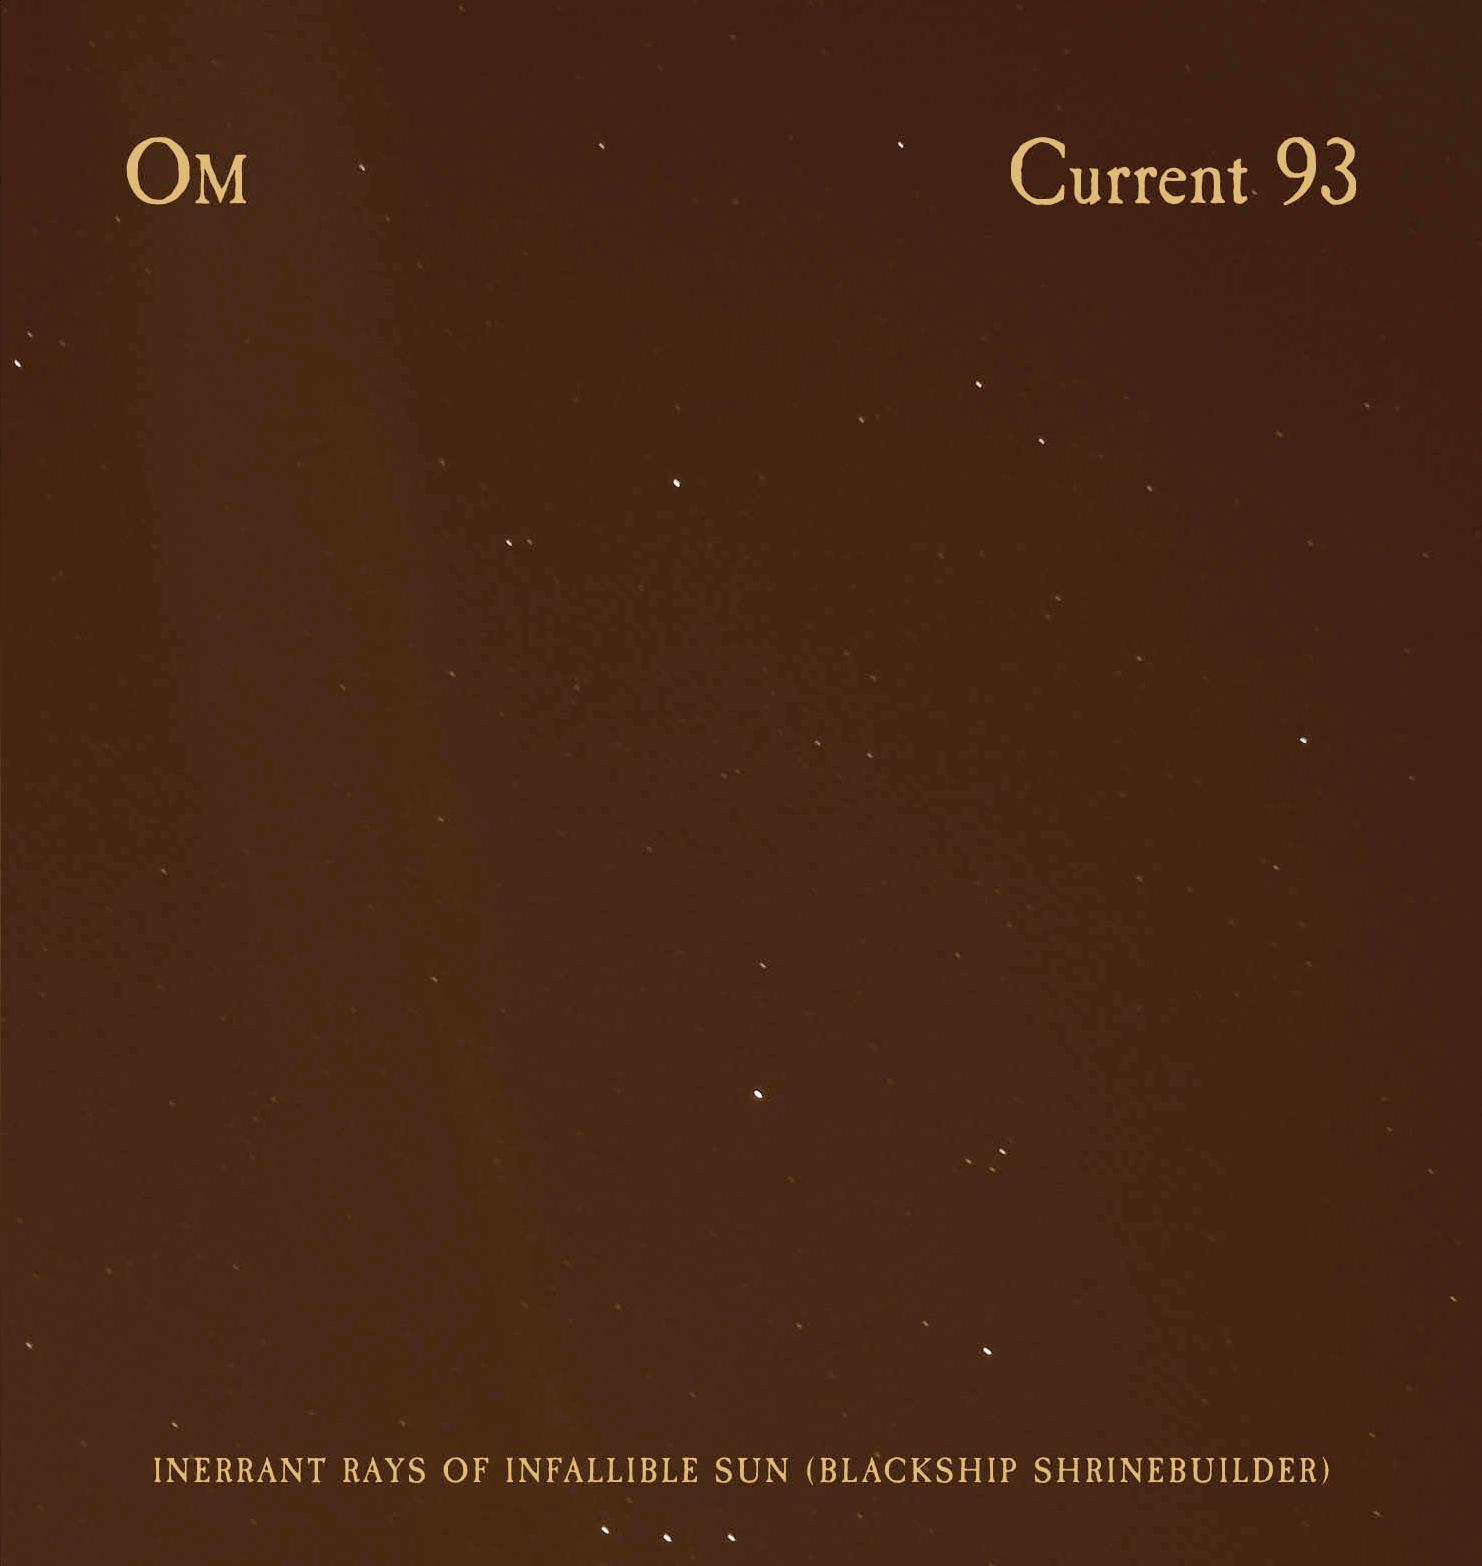 CURRENT 93 / OMINERRANT RAYS OFINFALLIBLE SUN(BLACKSHIP SHRINEBUILDER) - NR043